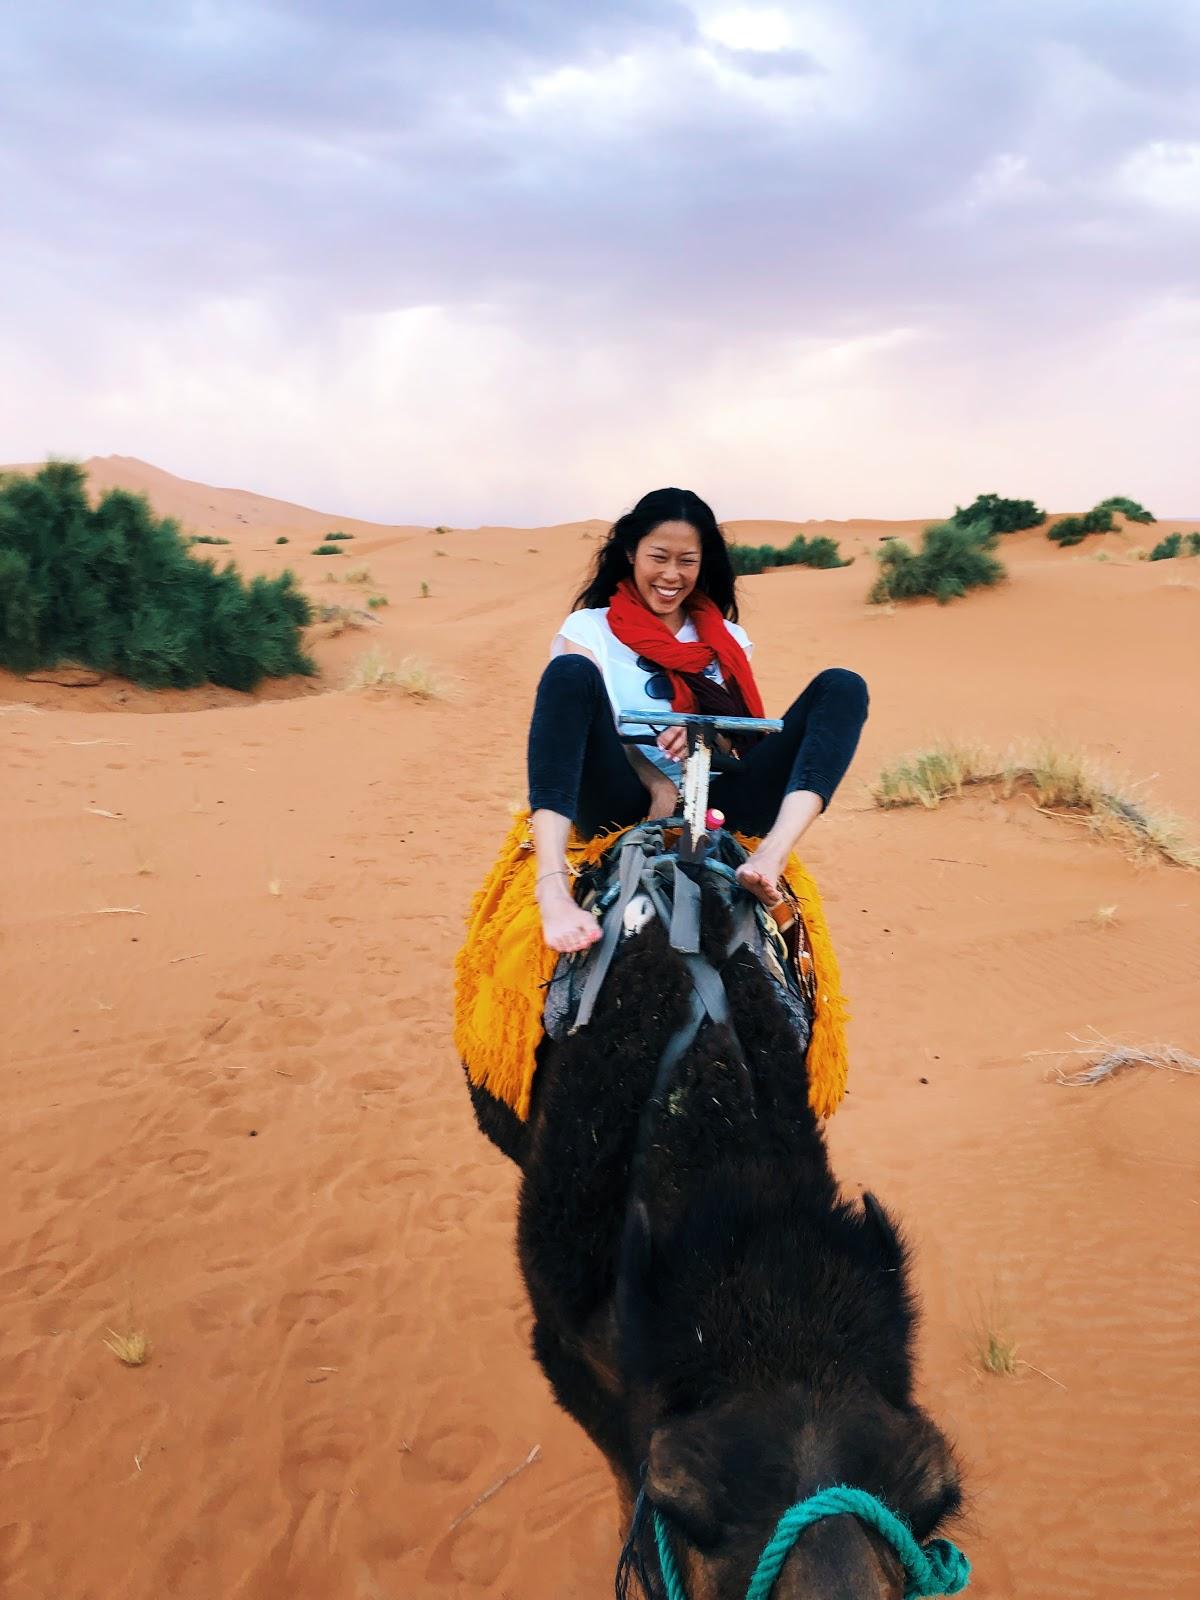 traveler-review-morocco-vacation-haley-camel-sahara.jpg